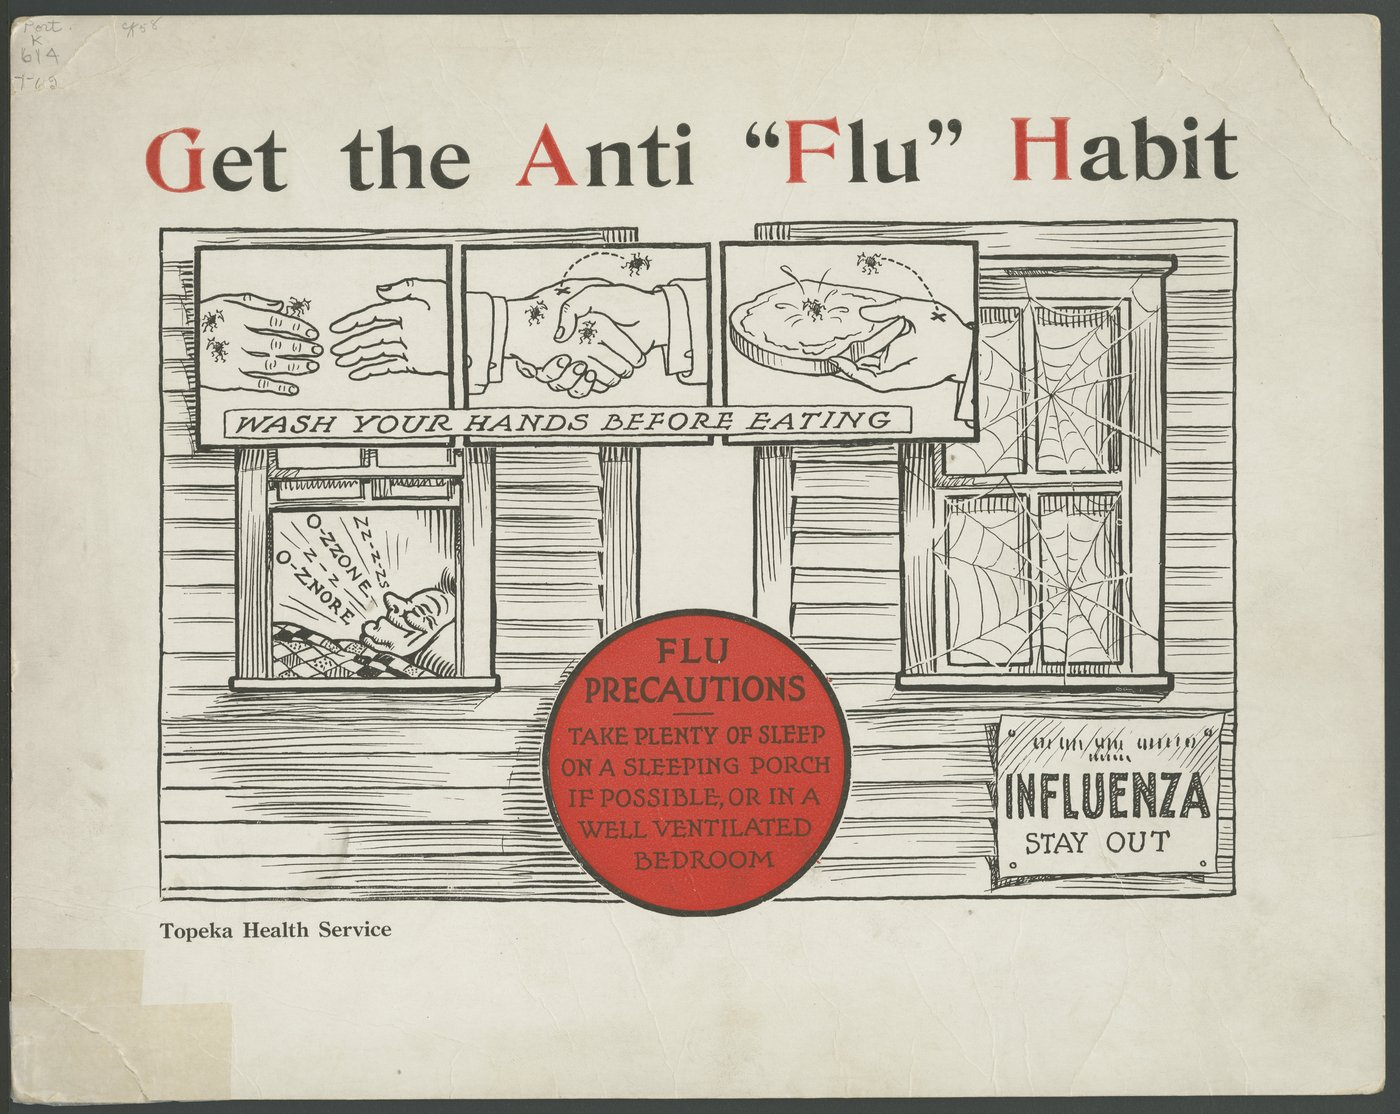 Get the anti flu habit